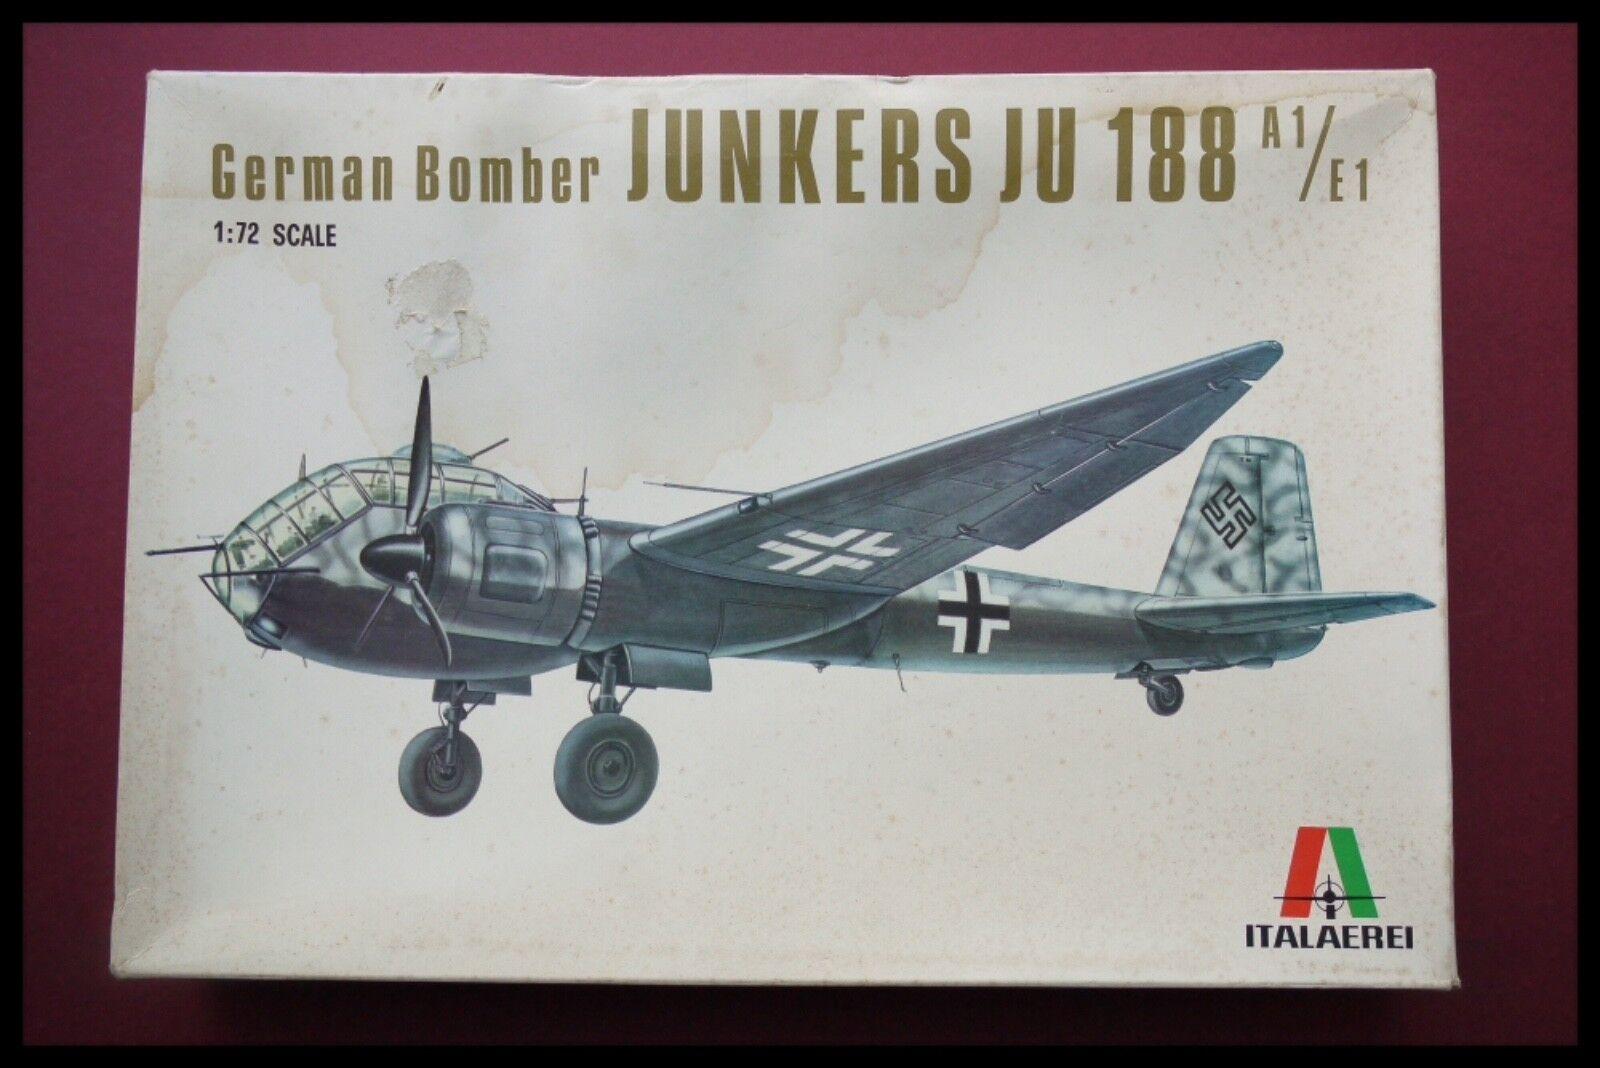 Italeri Italaerei 1 72 Junkers Ju188 A1   E1  Bomber Model Kit